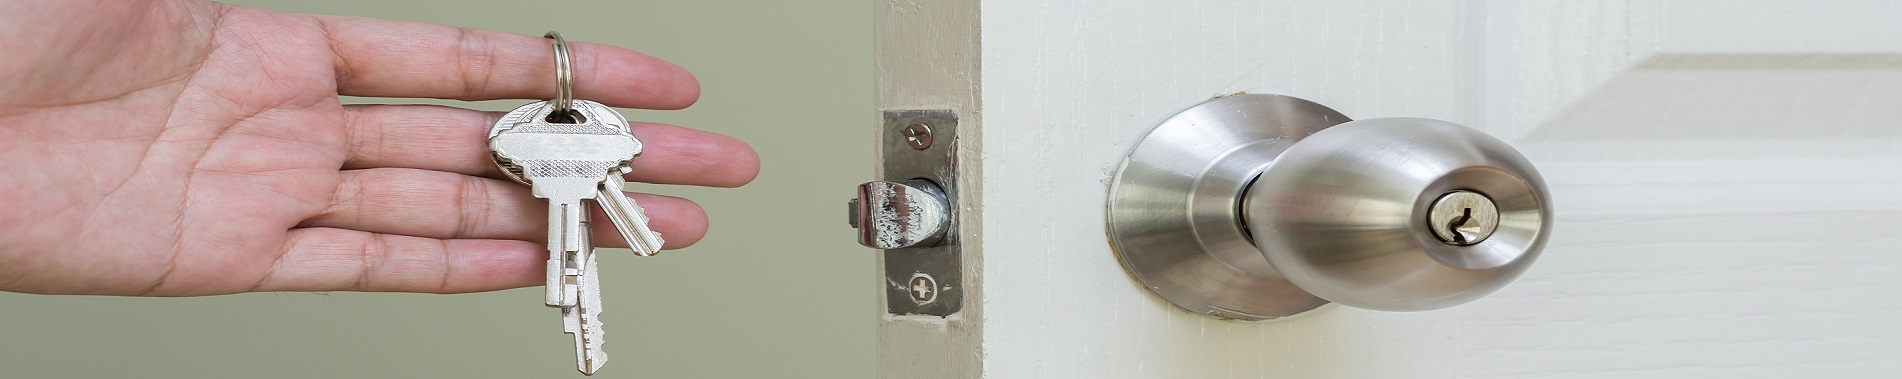 Locksmith Westminster CO - Denver Experts Locksmith